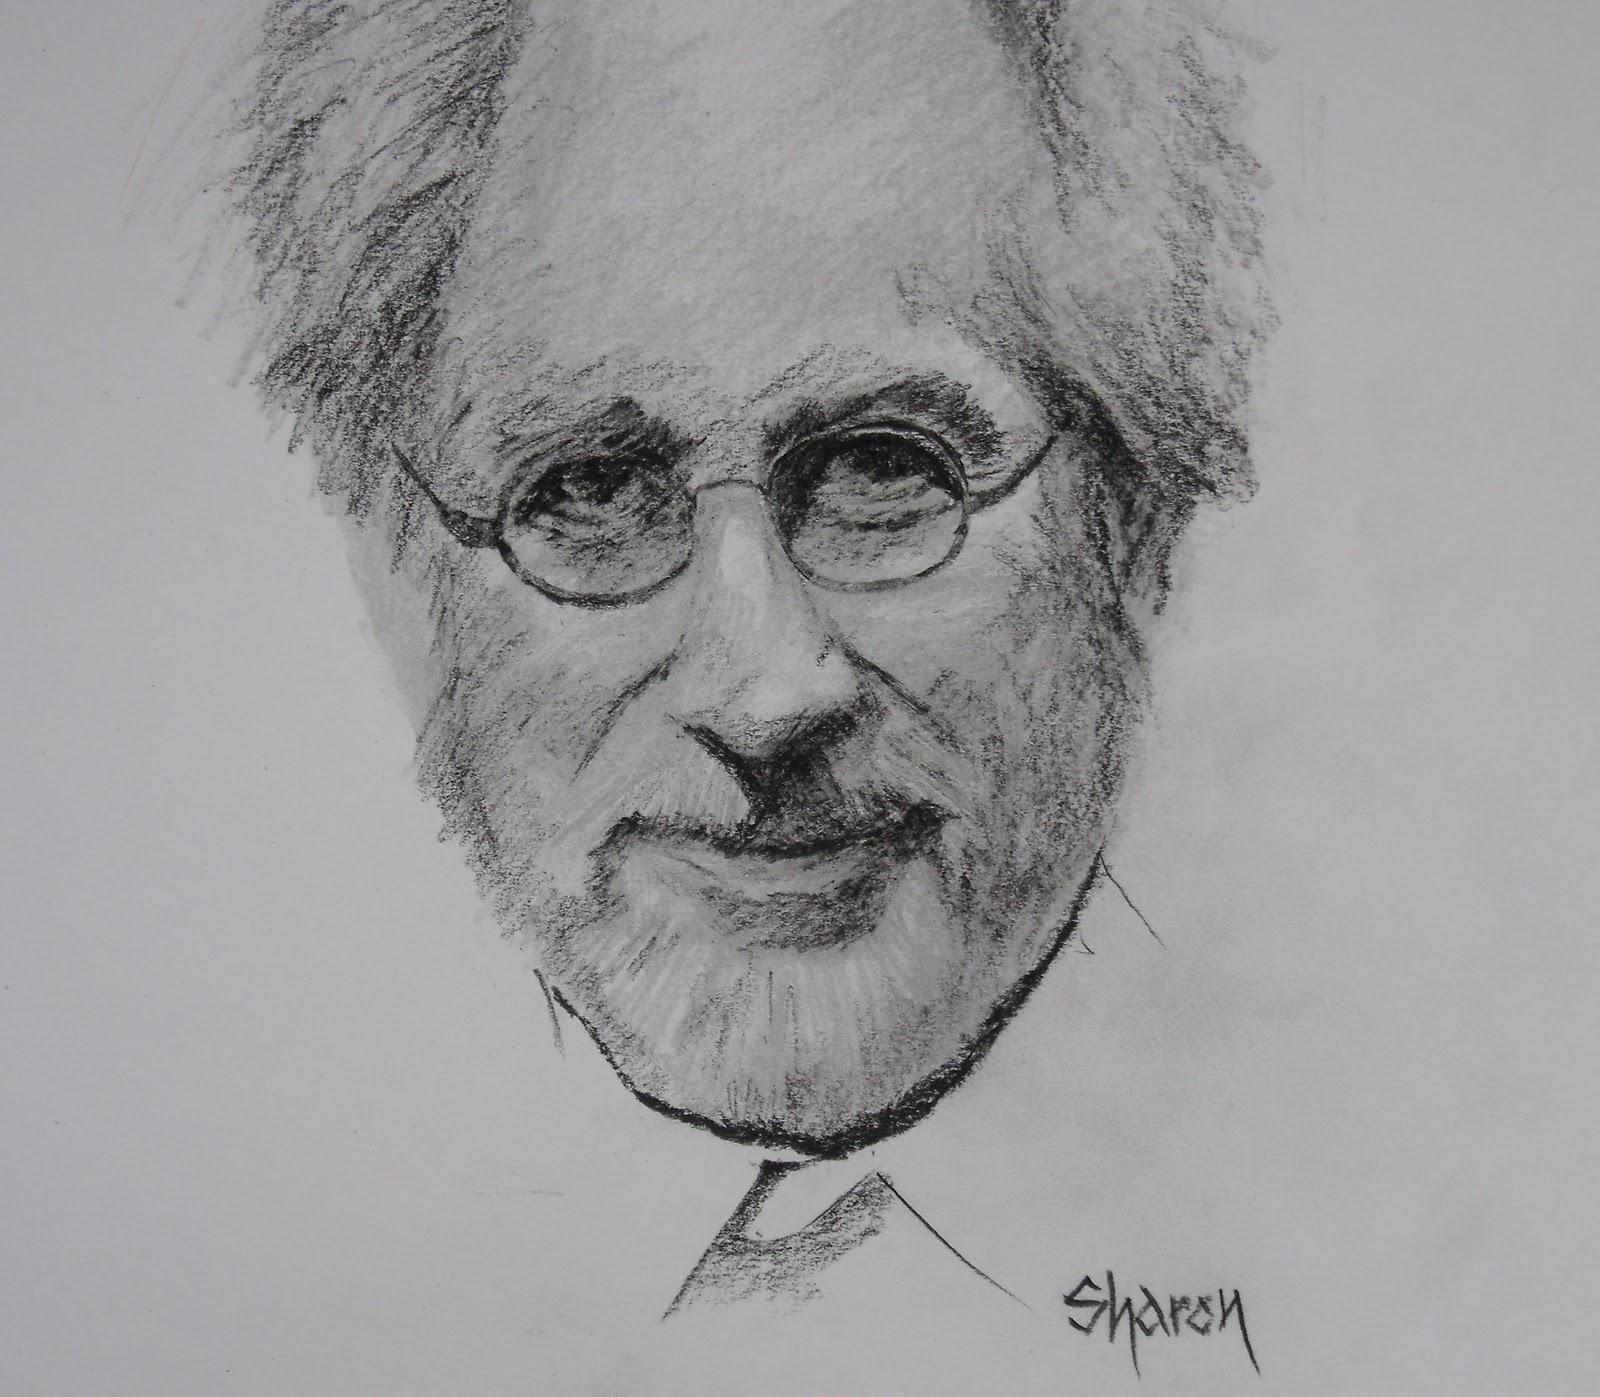 http://4.bp.blogspot.com/_LYws3f_LSvc/TGVfiTYAwYI/AAAAAAAABY4/ze2bKT8F5YI/s1600/Steven+Spielberg.jpg